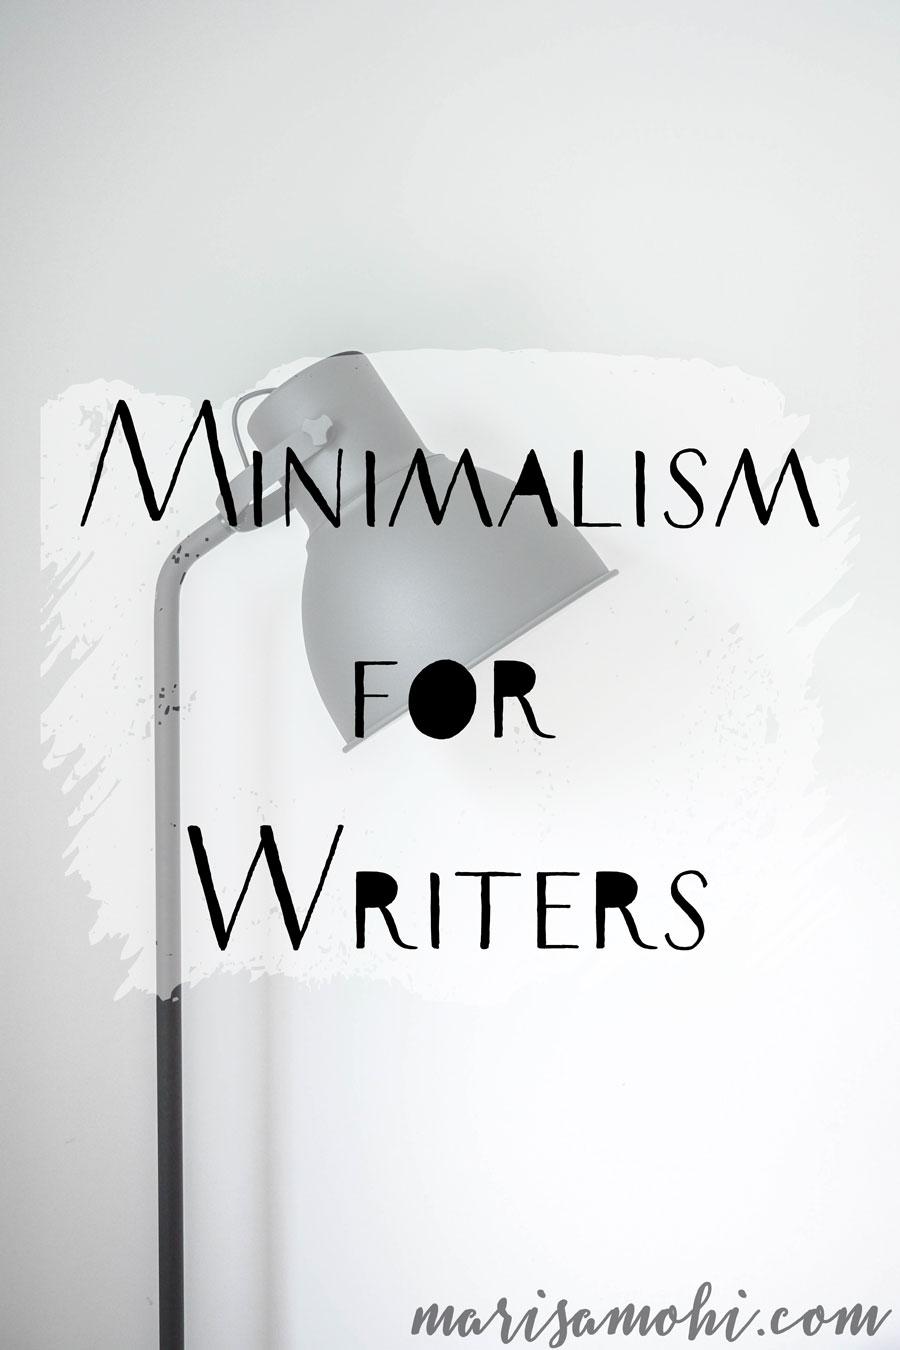 Minimalism for Writers